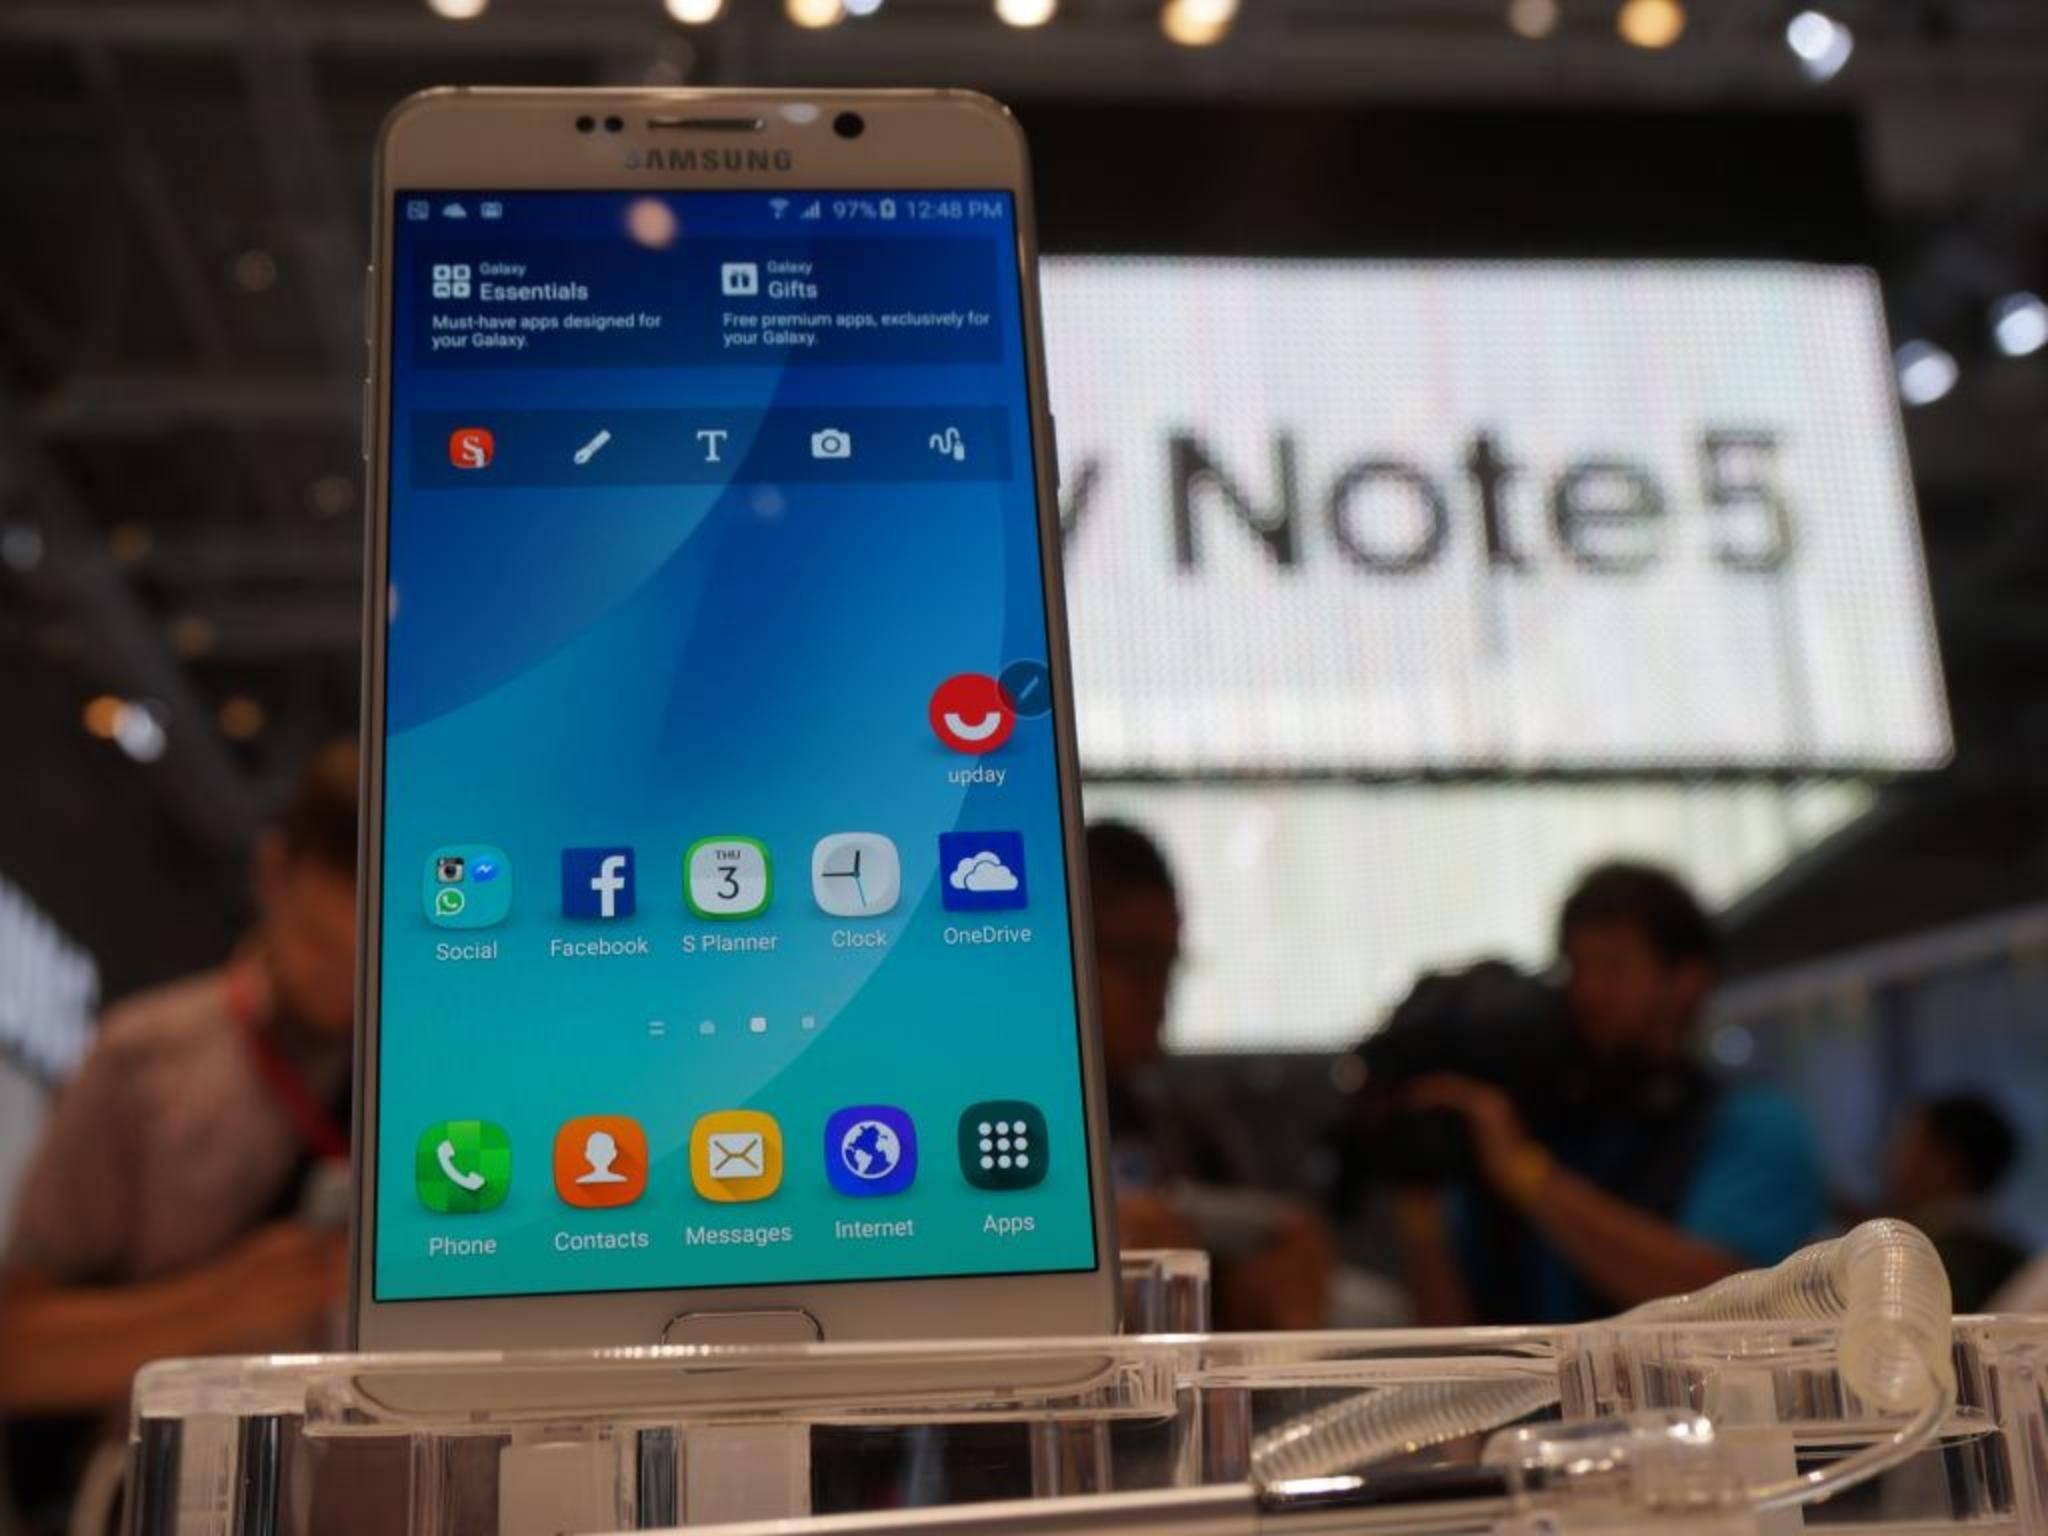 Release-Gerücht: Galaxy Note 5 kommt Januar 2016 nach Europa